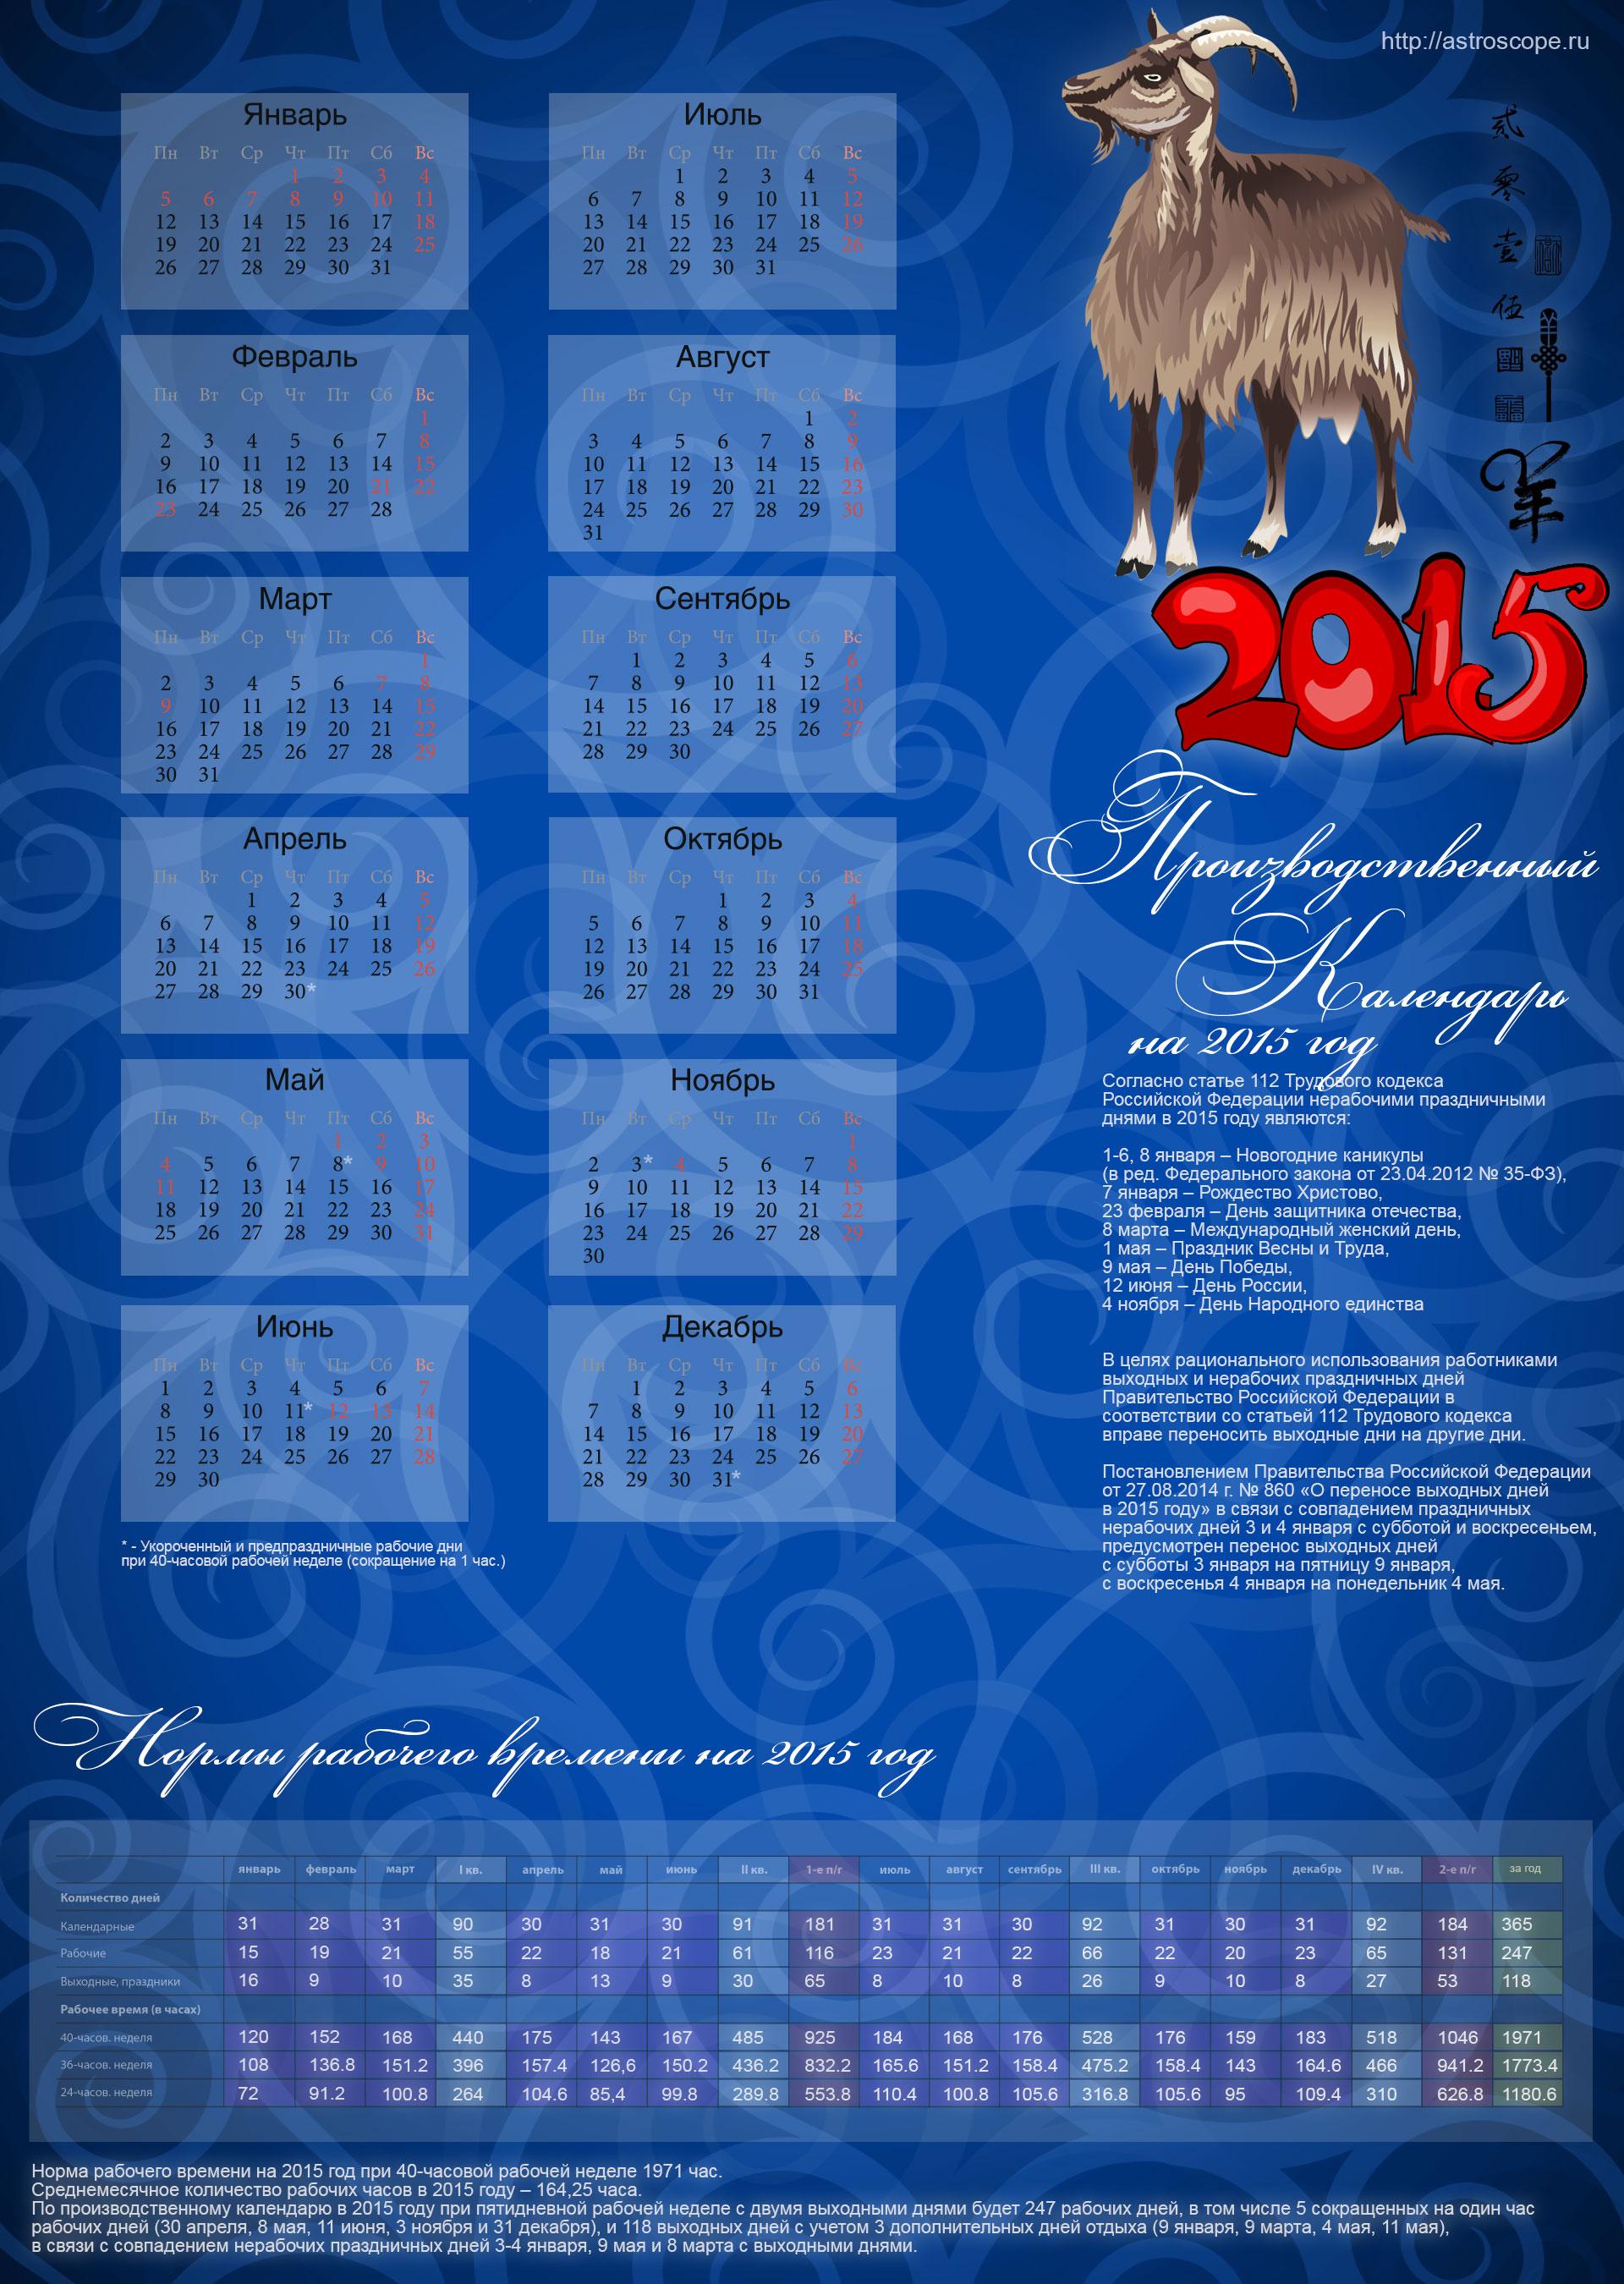 Стрижки в феврале 2015 по лунному календарю